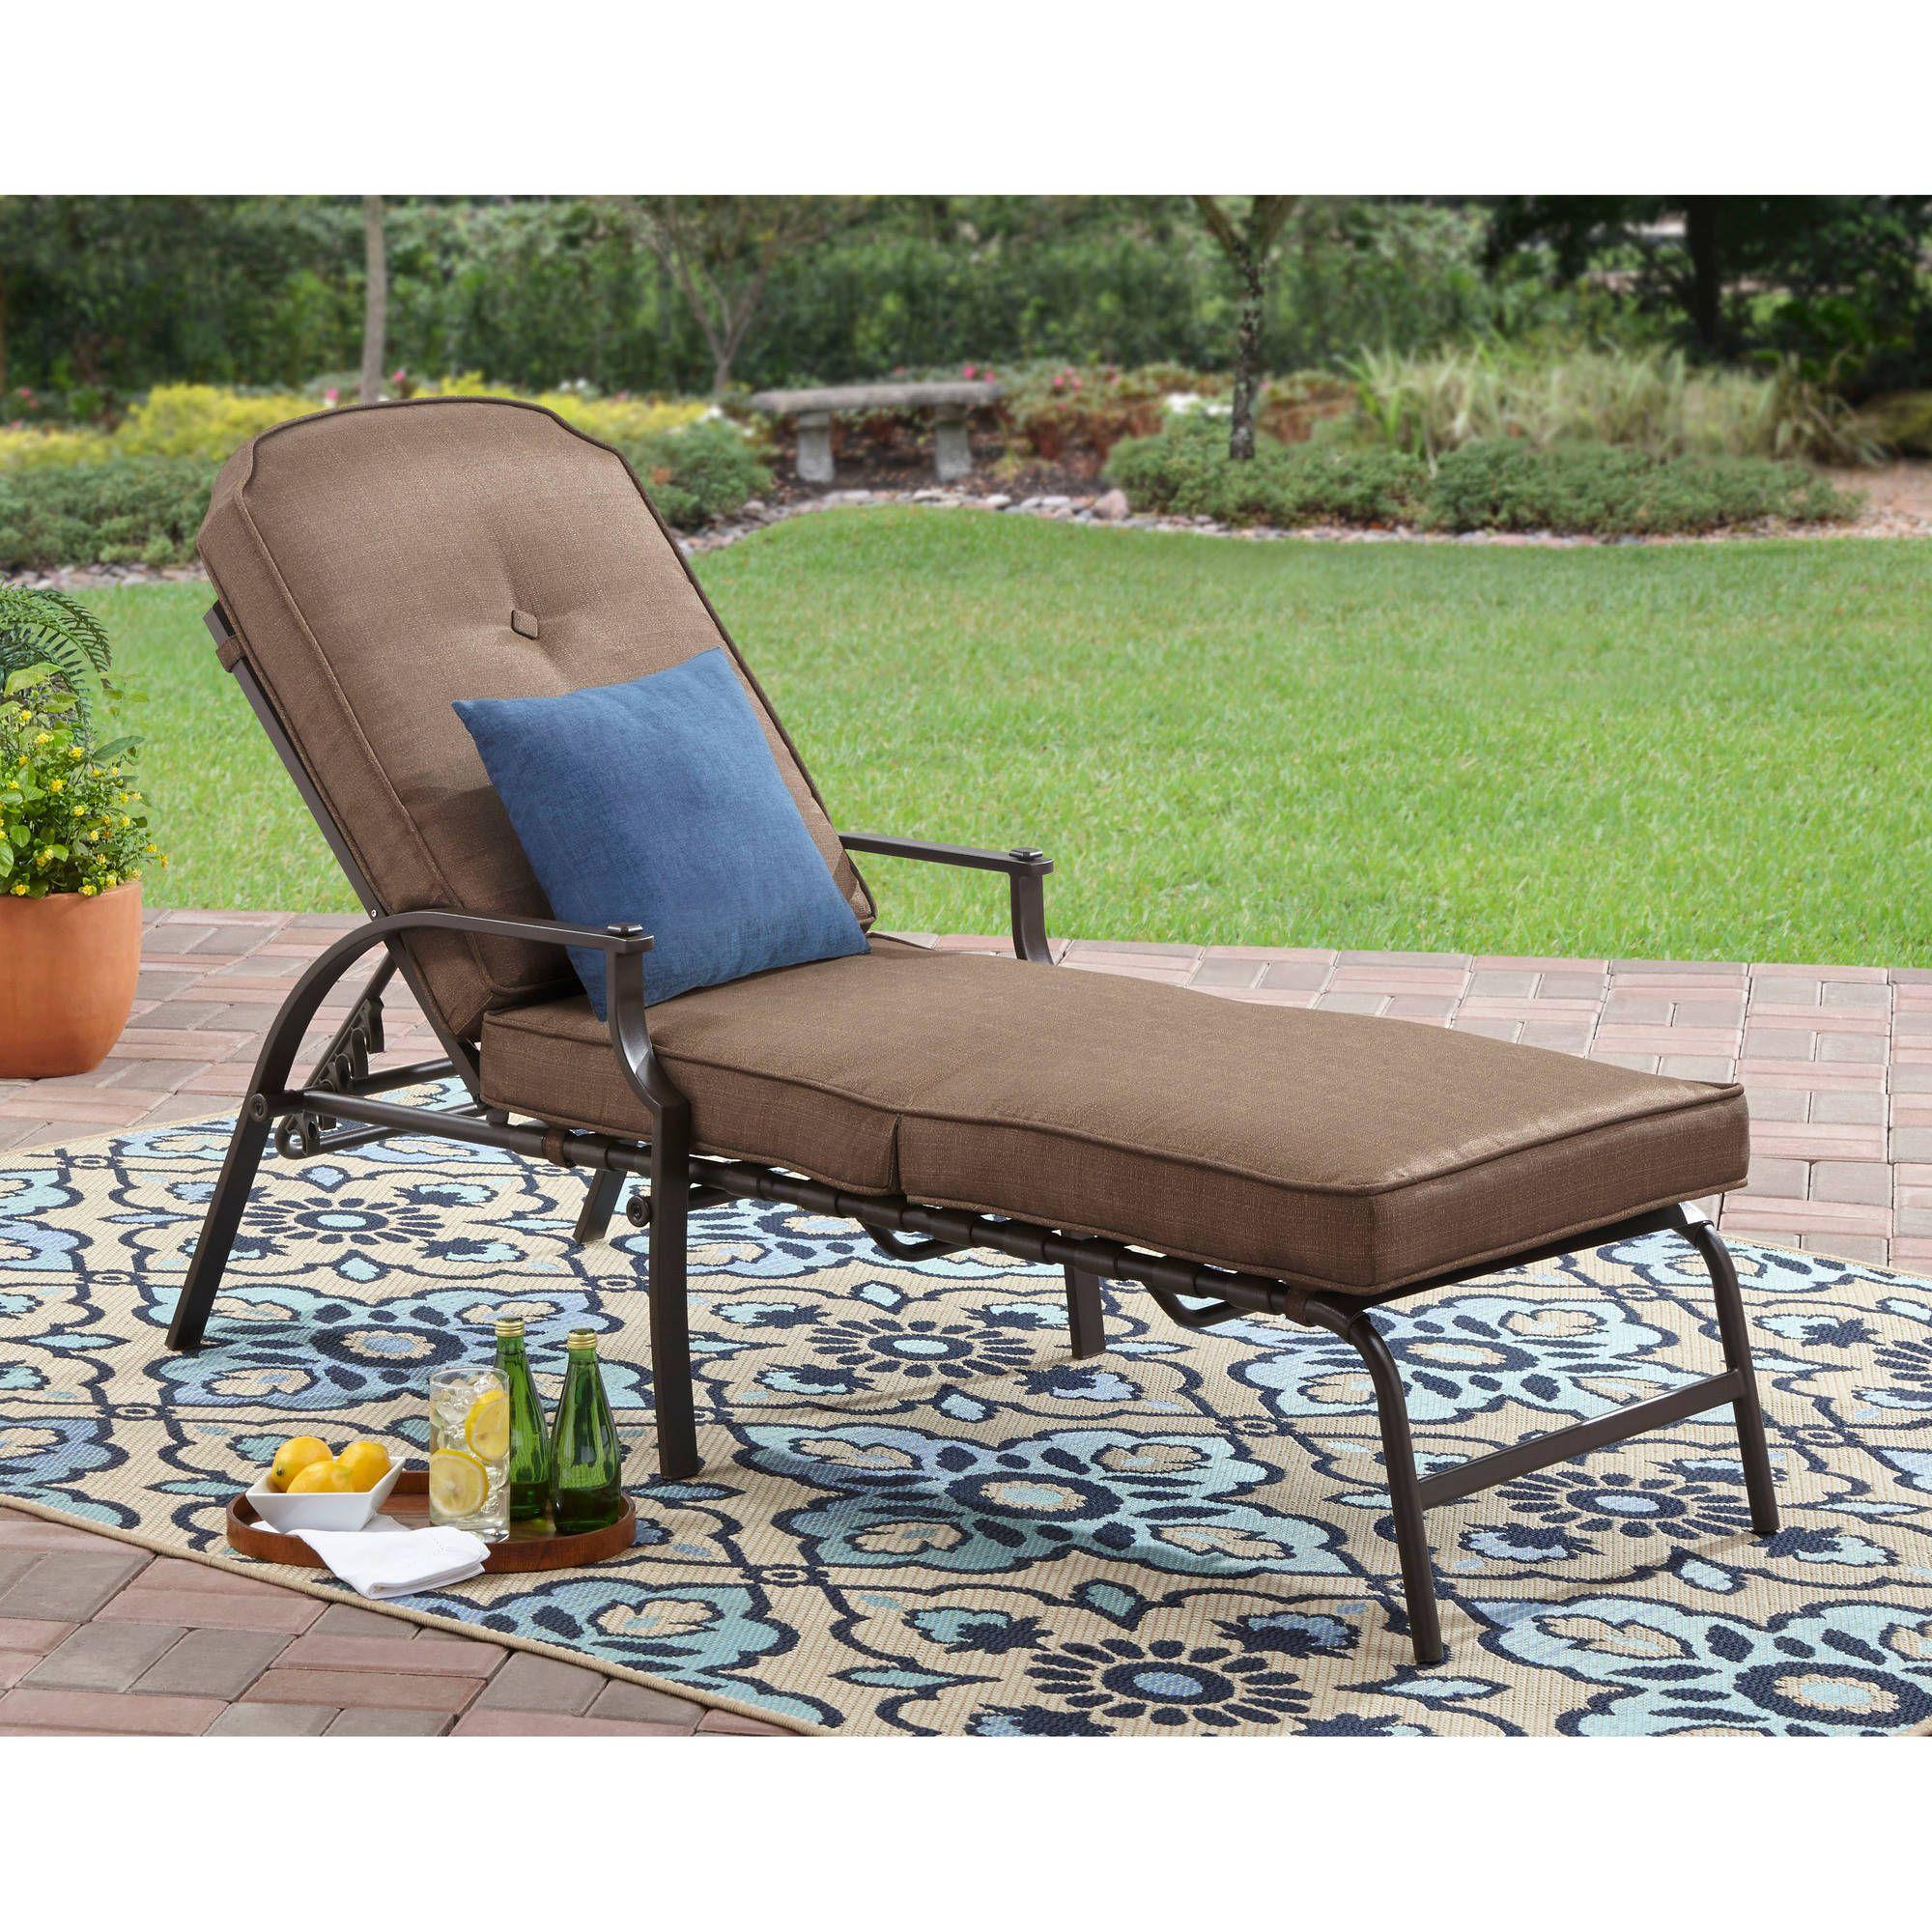 Patio Lounge Stuhle Zum Verkauf Kaufen Outdoor Lounge Folding